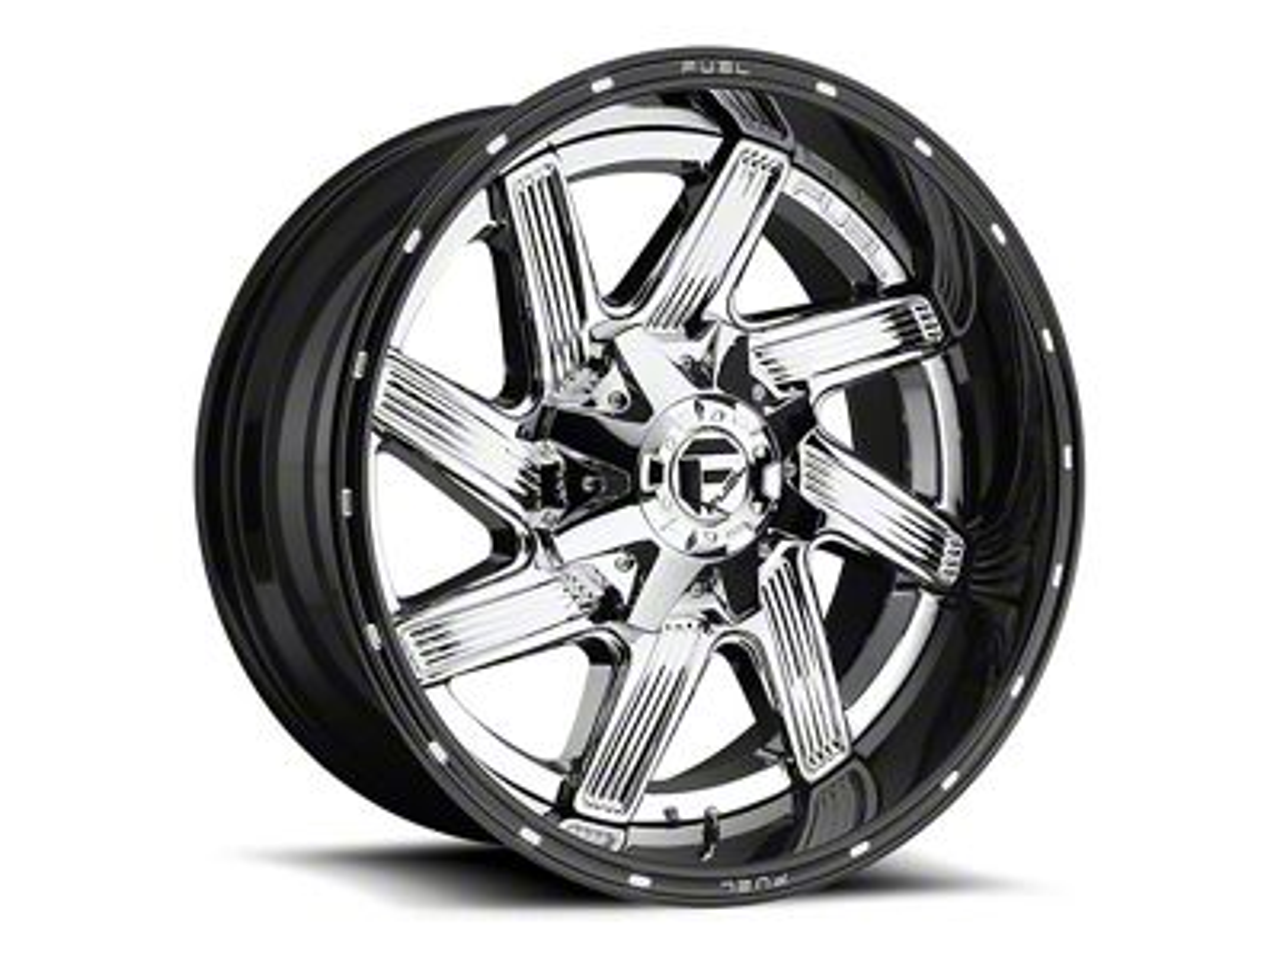 Fuel Wheels Moab Chrome 6-Lug Wheel - 22x10 (07-18 Sierra 1500)